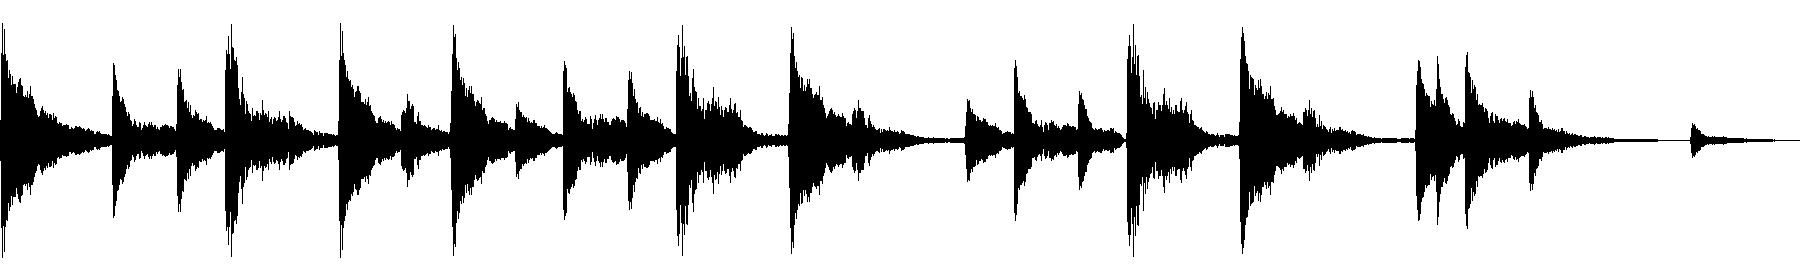 g abs05 059